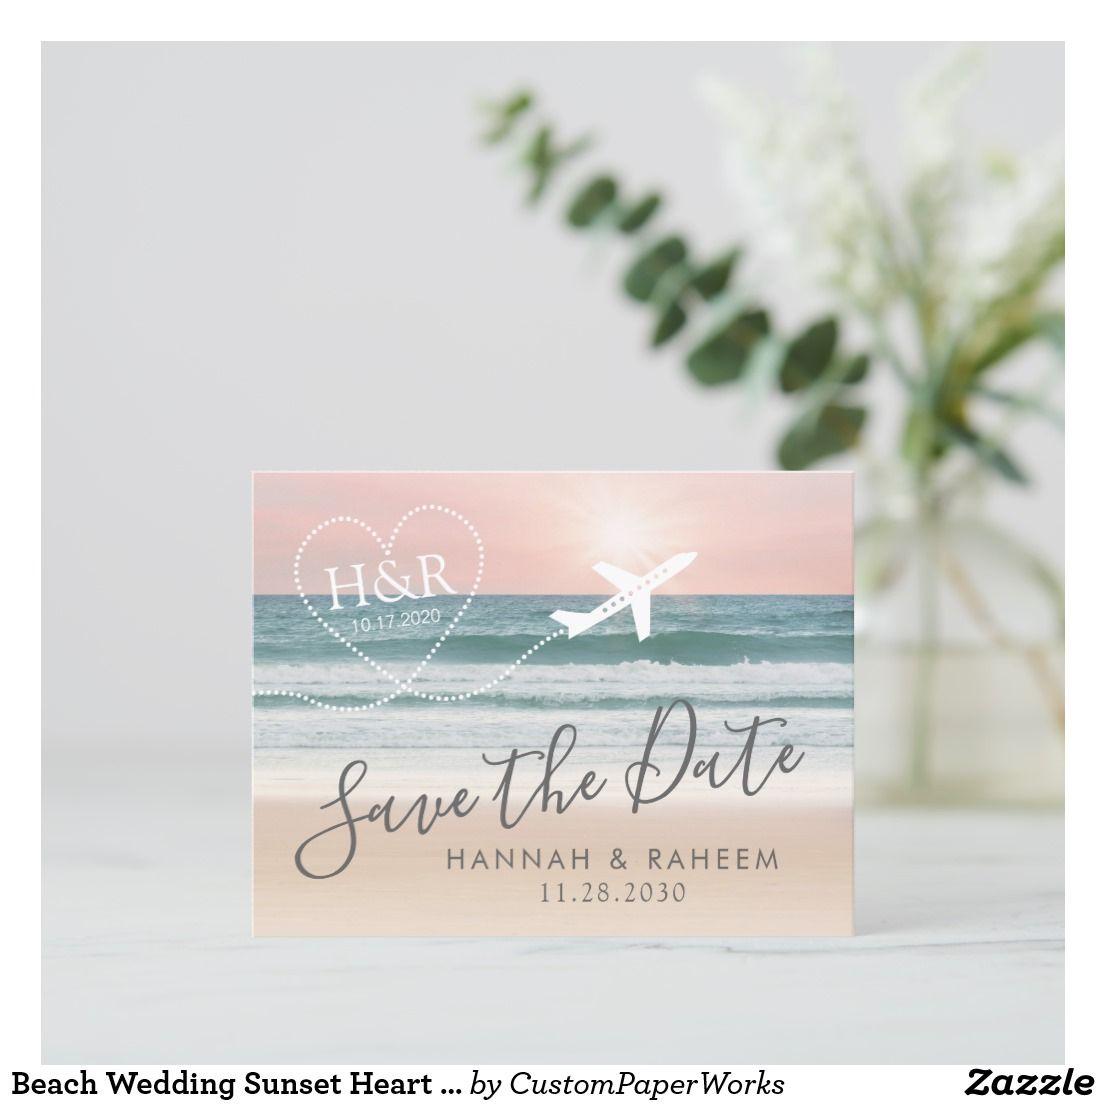 Sunset Beach Wedding Ideas: Beach Wedding Sunset Heart Airplane Save The Date